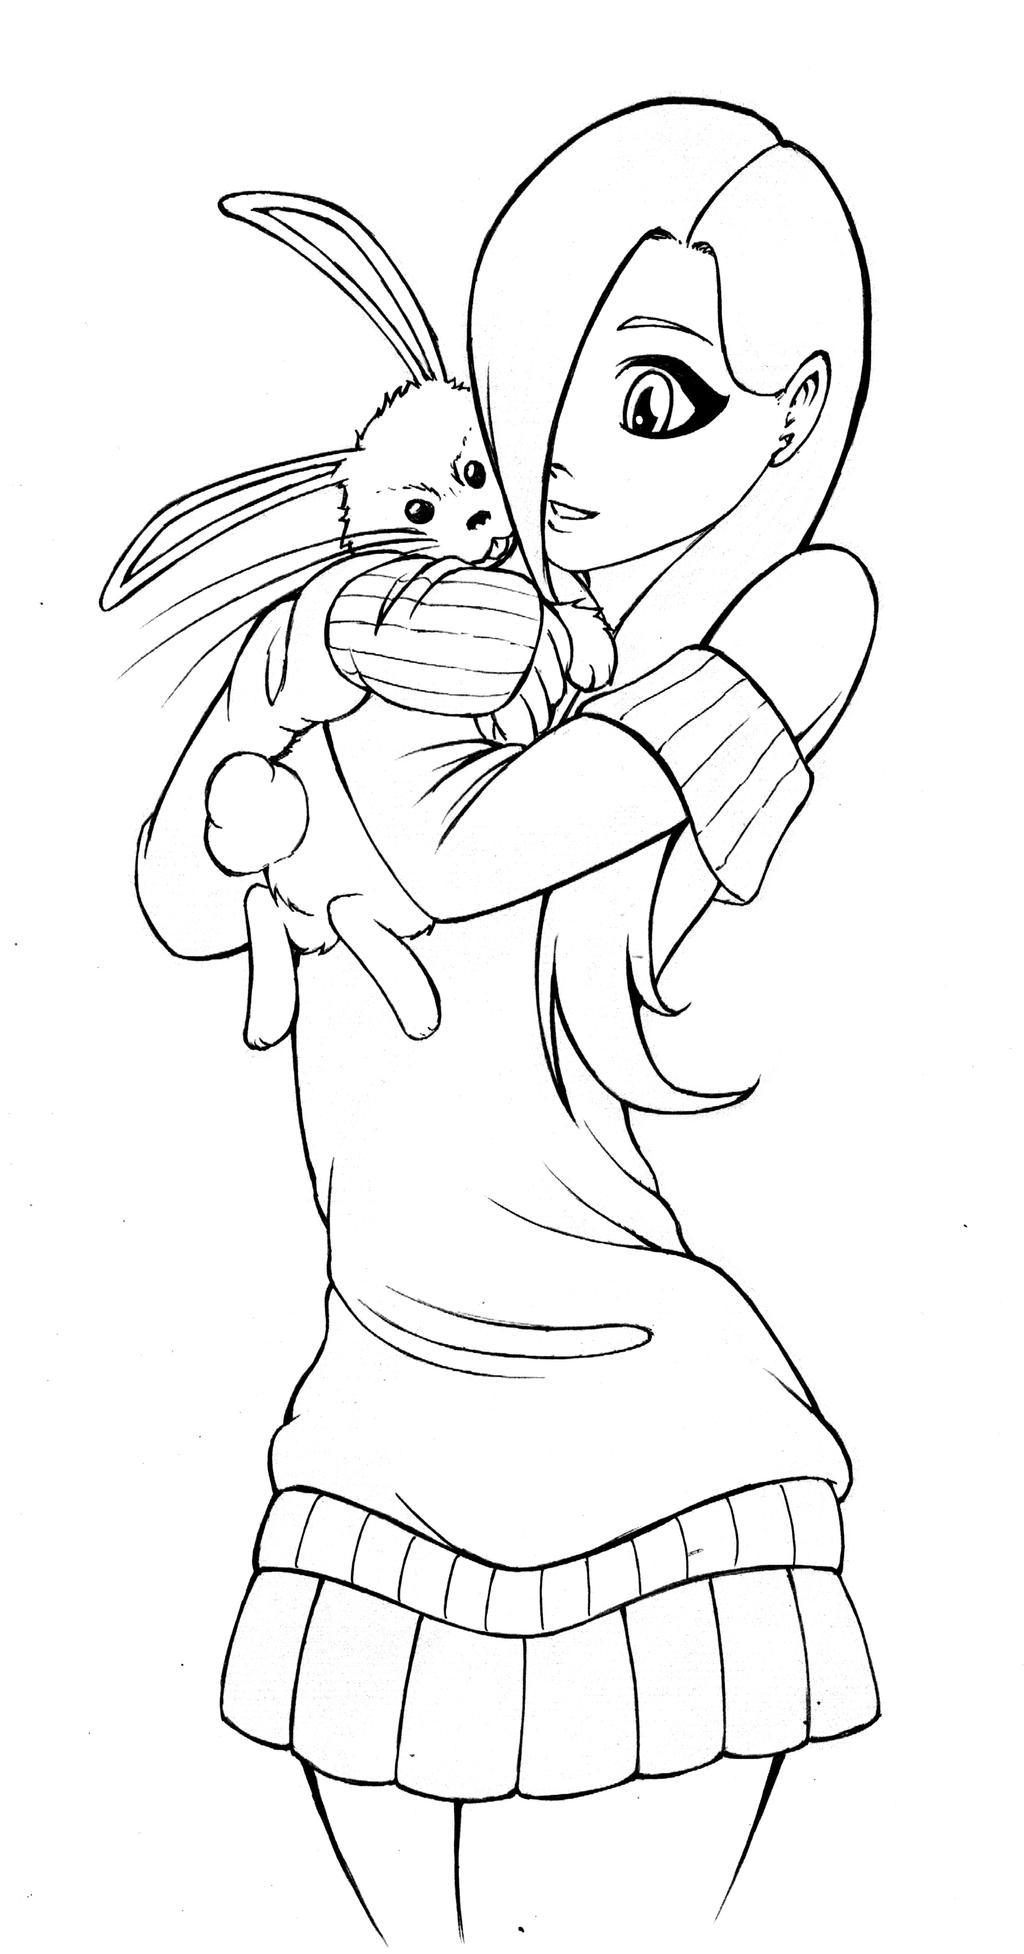 Line Drawing Angel : Fluttershy and angel line art by arucardpl on deviantart